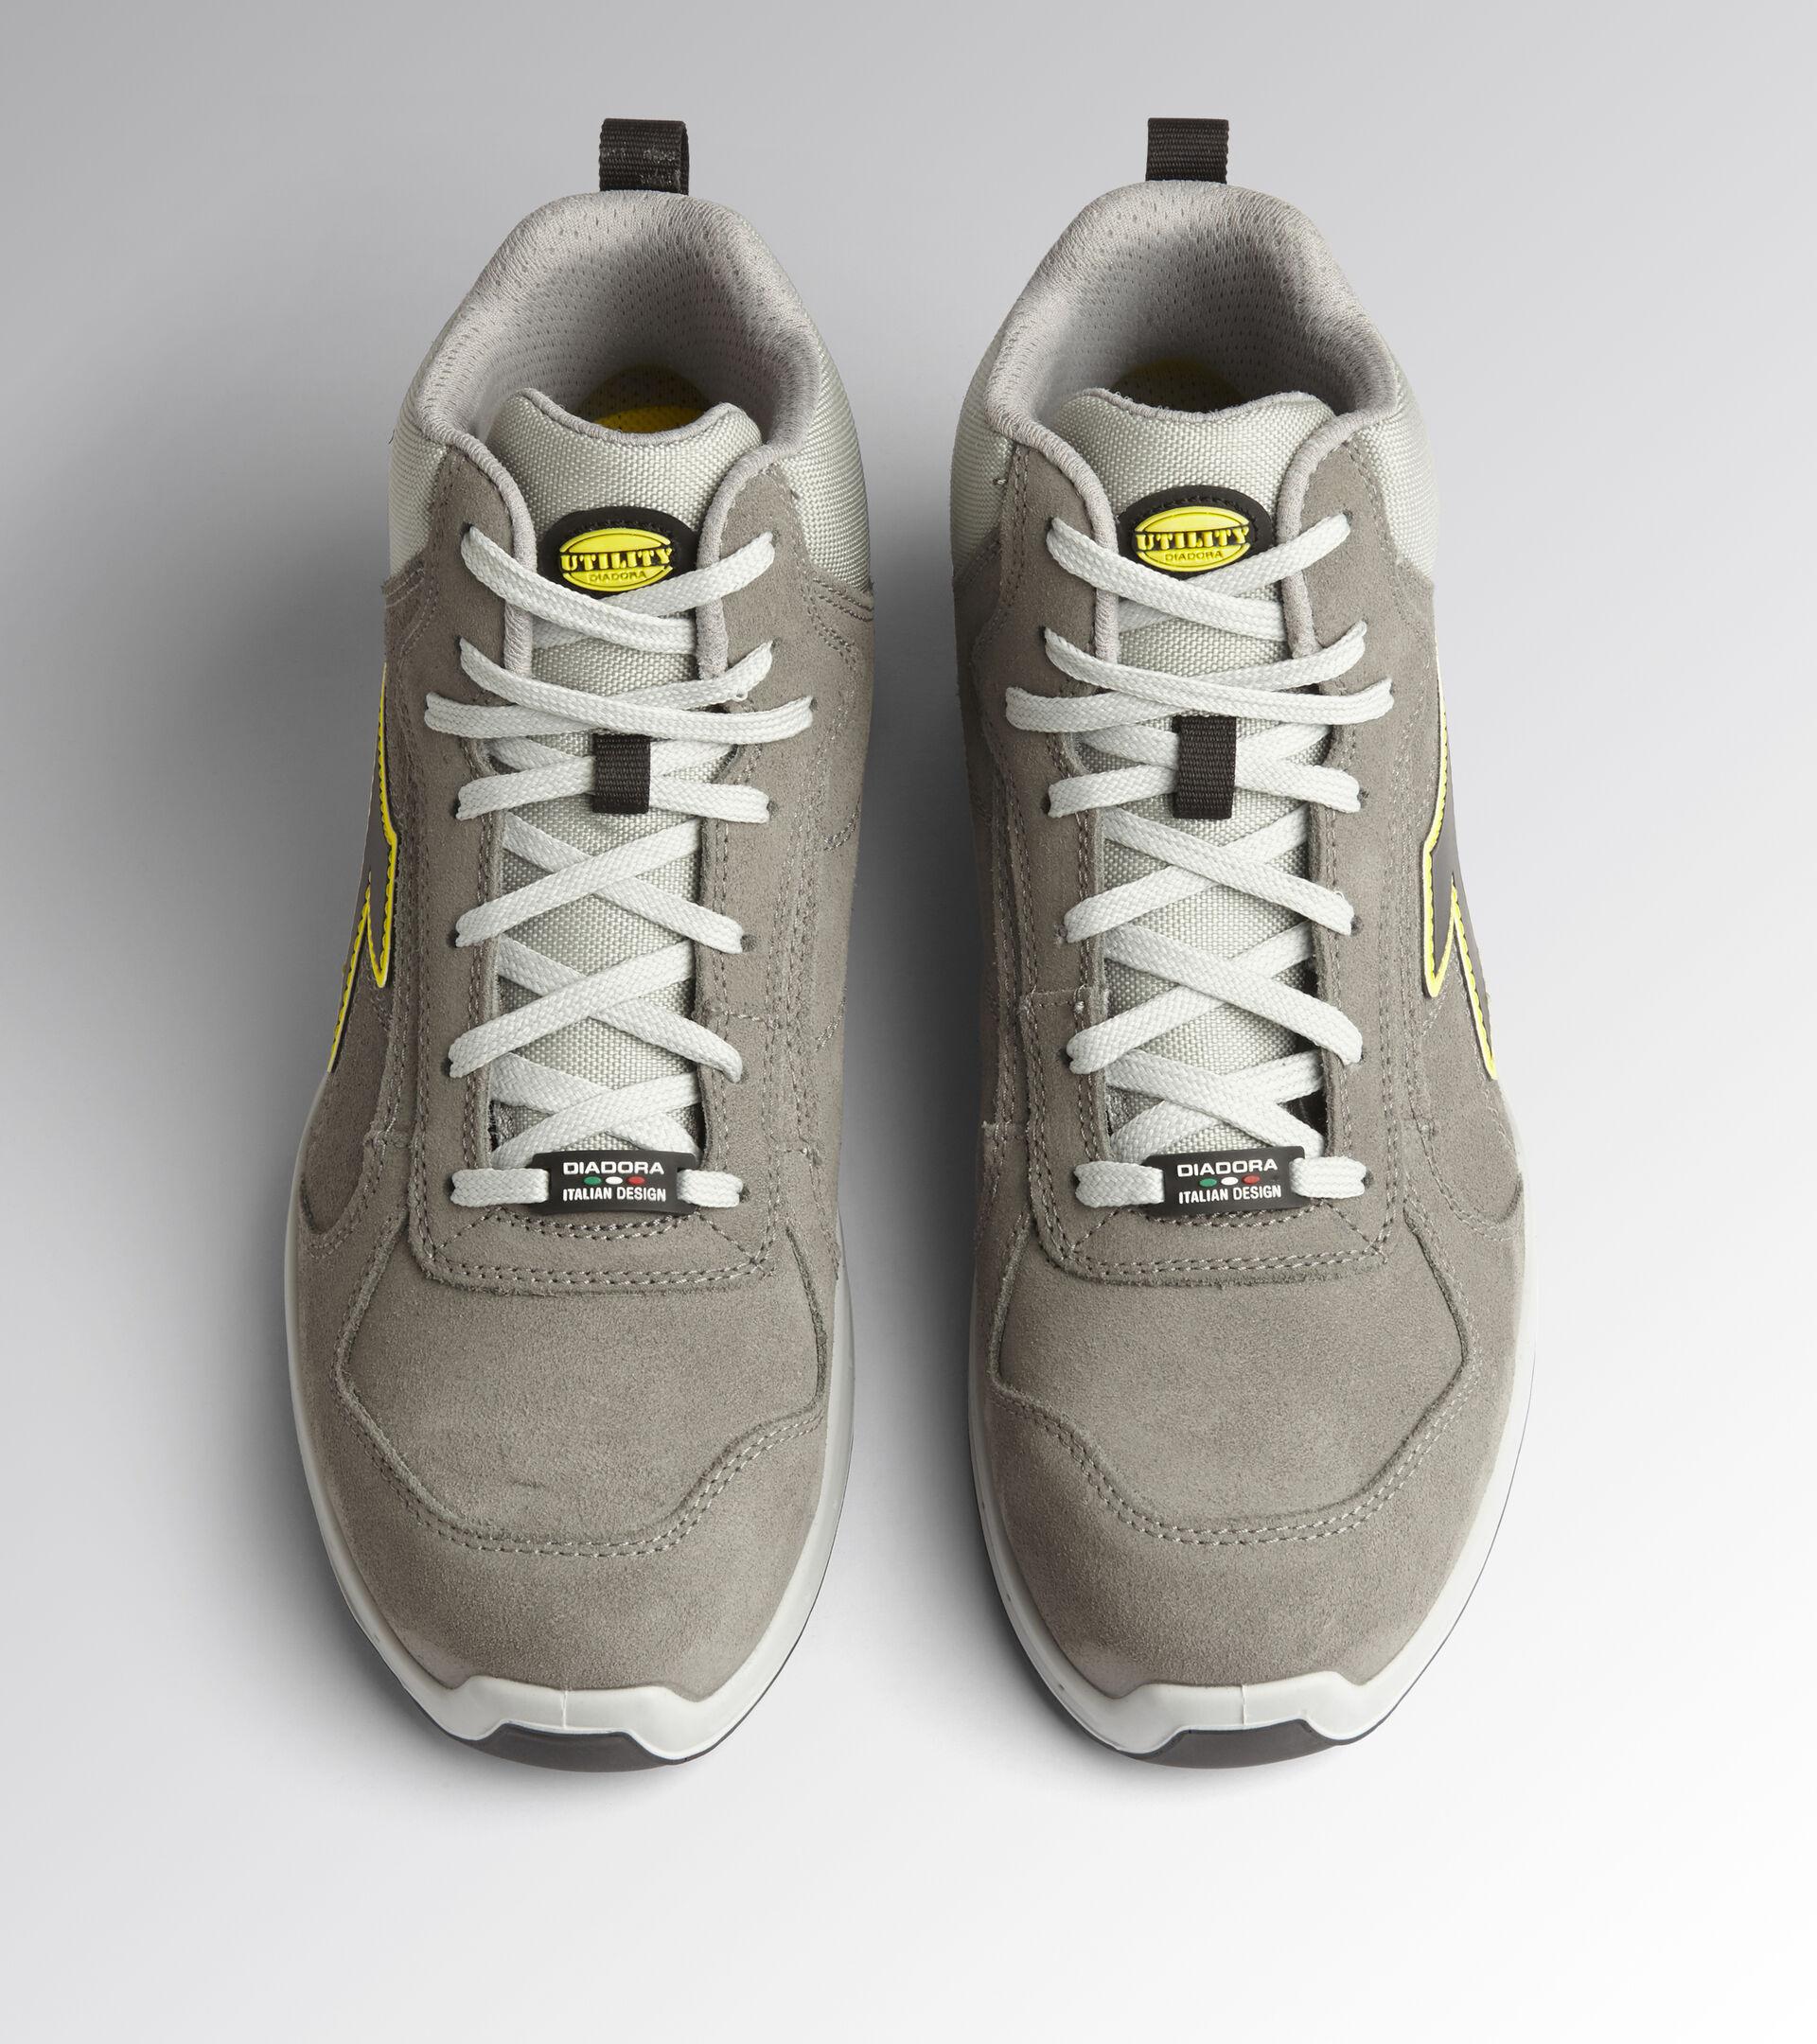 Footwear Utility UNISEX RUN NET AIRBOX MID S3 SRC WIND GRAY/WIND GRAY Utility